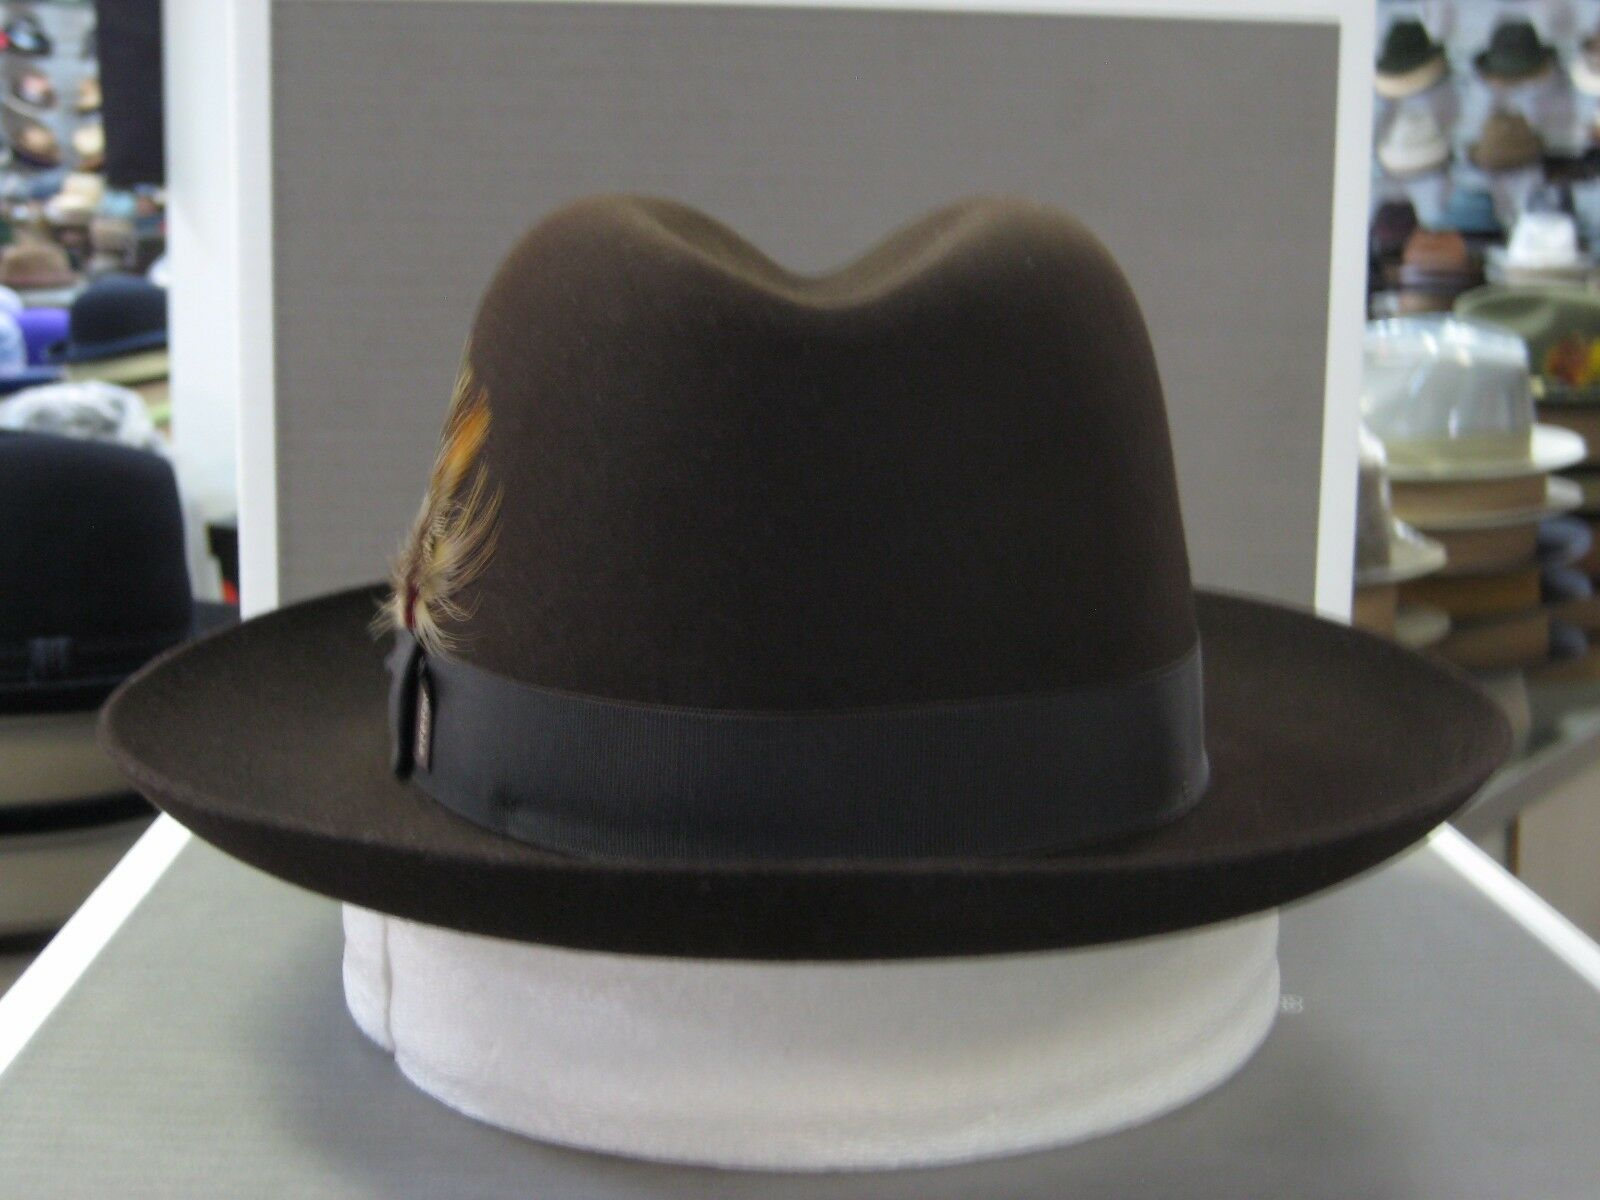 d6e96ab2a2c3f Stetson Sutley Cordova Fur Felt Fedora Dress Hat 7 3/4 for sale online |  eBay